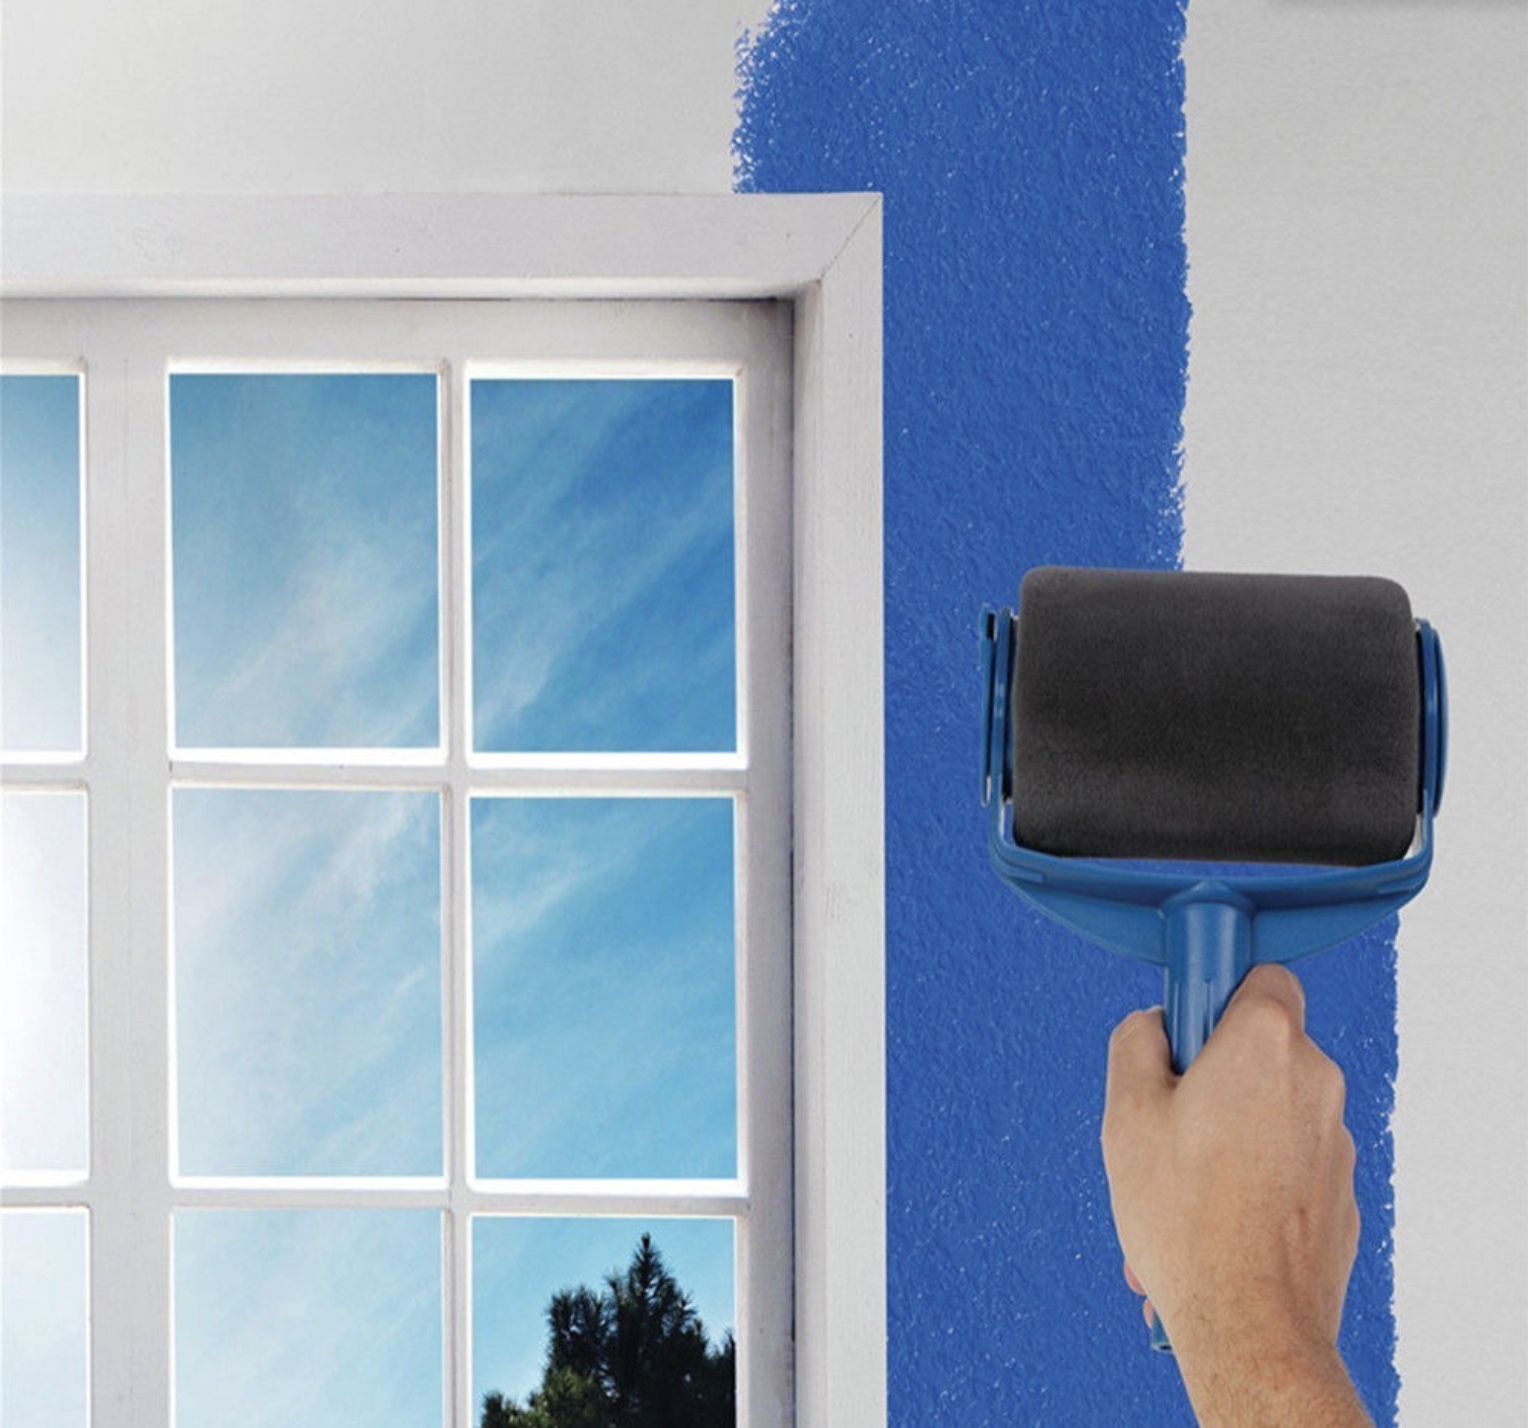 8pcs Wall Decorate Painting Roller Brush Set Paint Runner Pro Brush Kit Multifunctional House Paint Rollers Runner Pro Tools Set